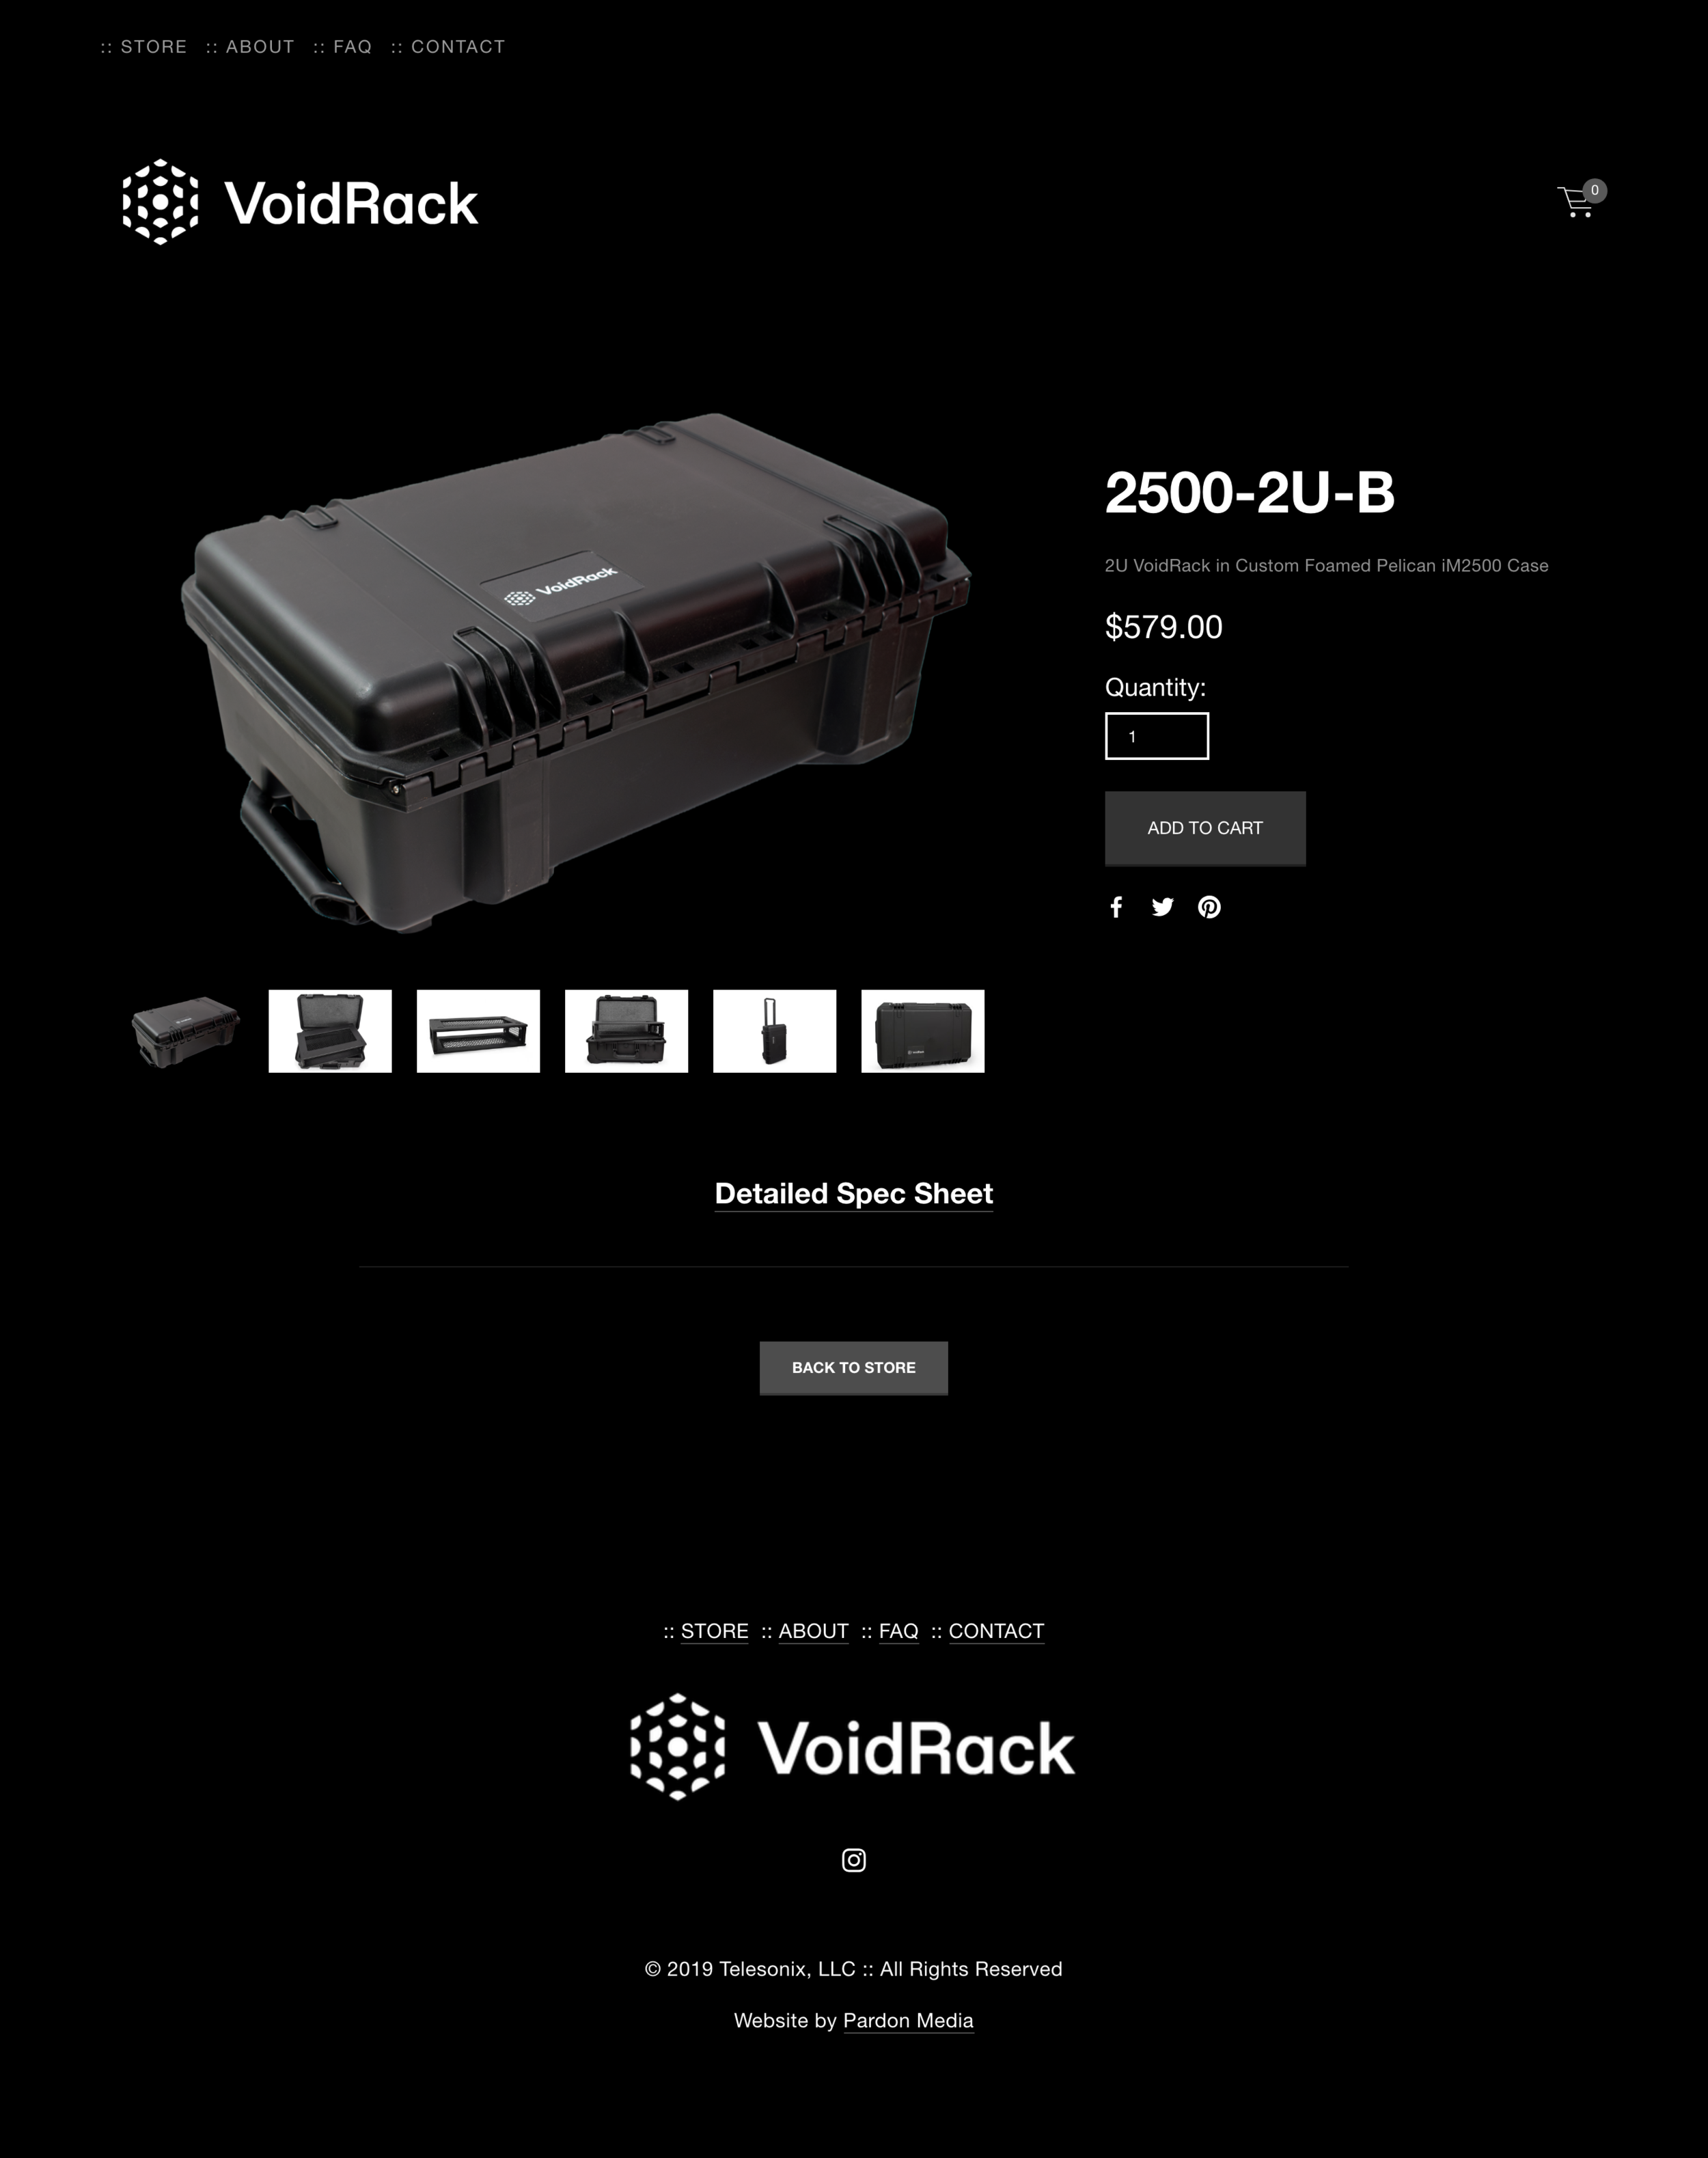 screencapture-voidrack-shop-voidrack-2500-2u-b-2018-12-23-21_12_15.png